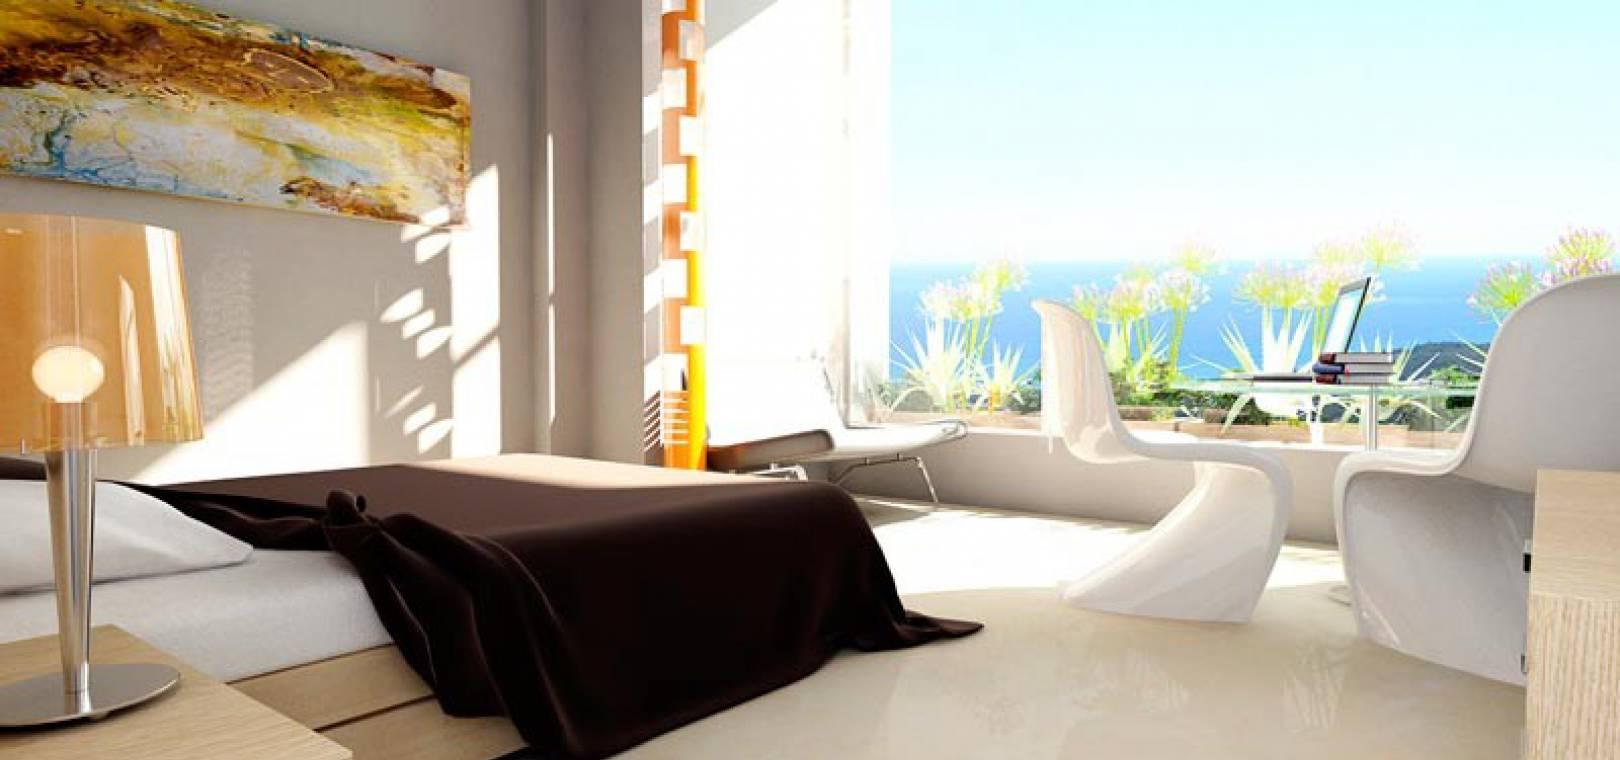 to buy,villas,modern,guardamar hills,guardamar,costa,blanca,op16-lounge